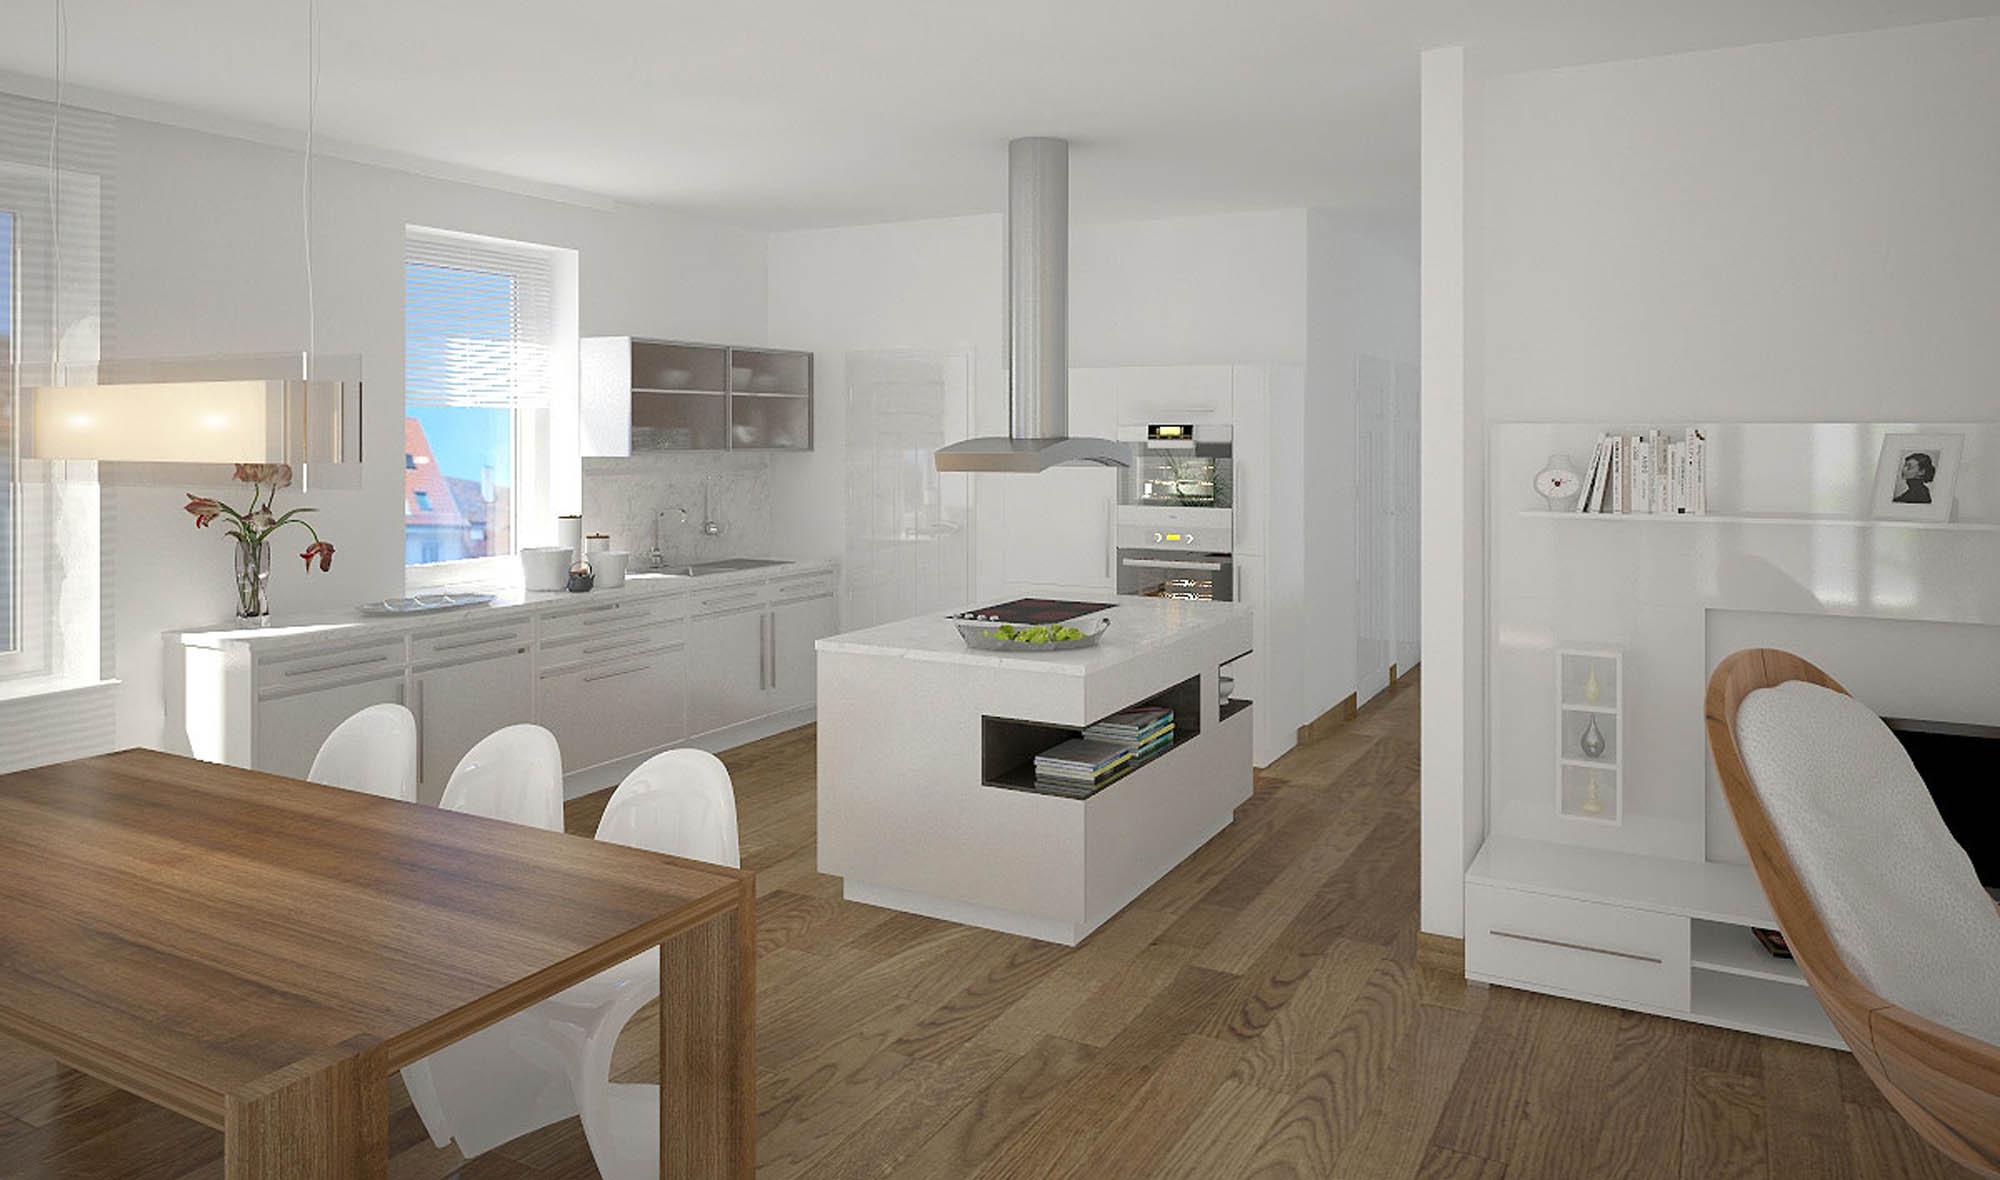 immobilienmakler haus verkaufen immobilienbewertung haus. Black Bedroom Furniture Sets. Home Design Ideas